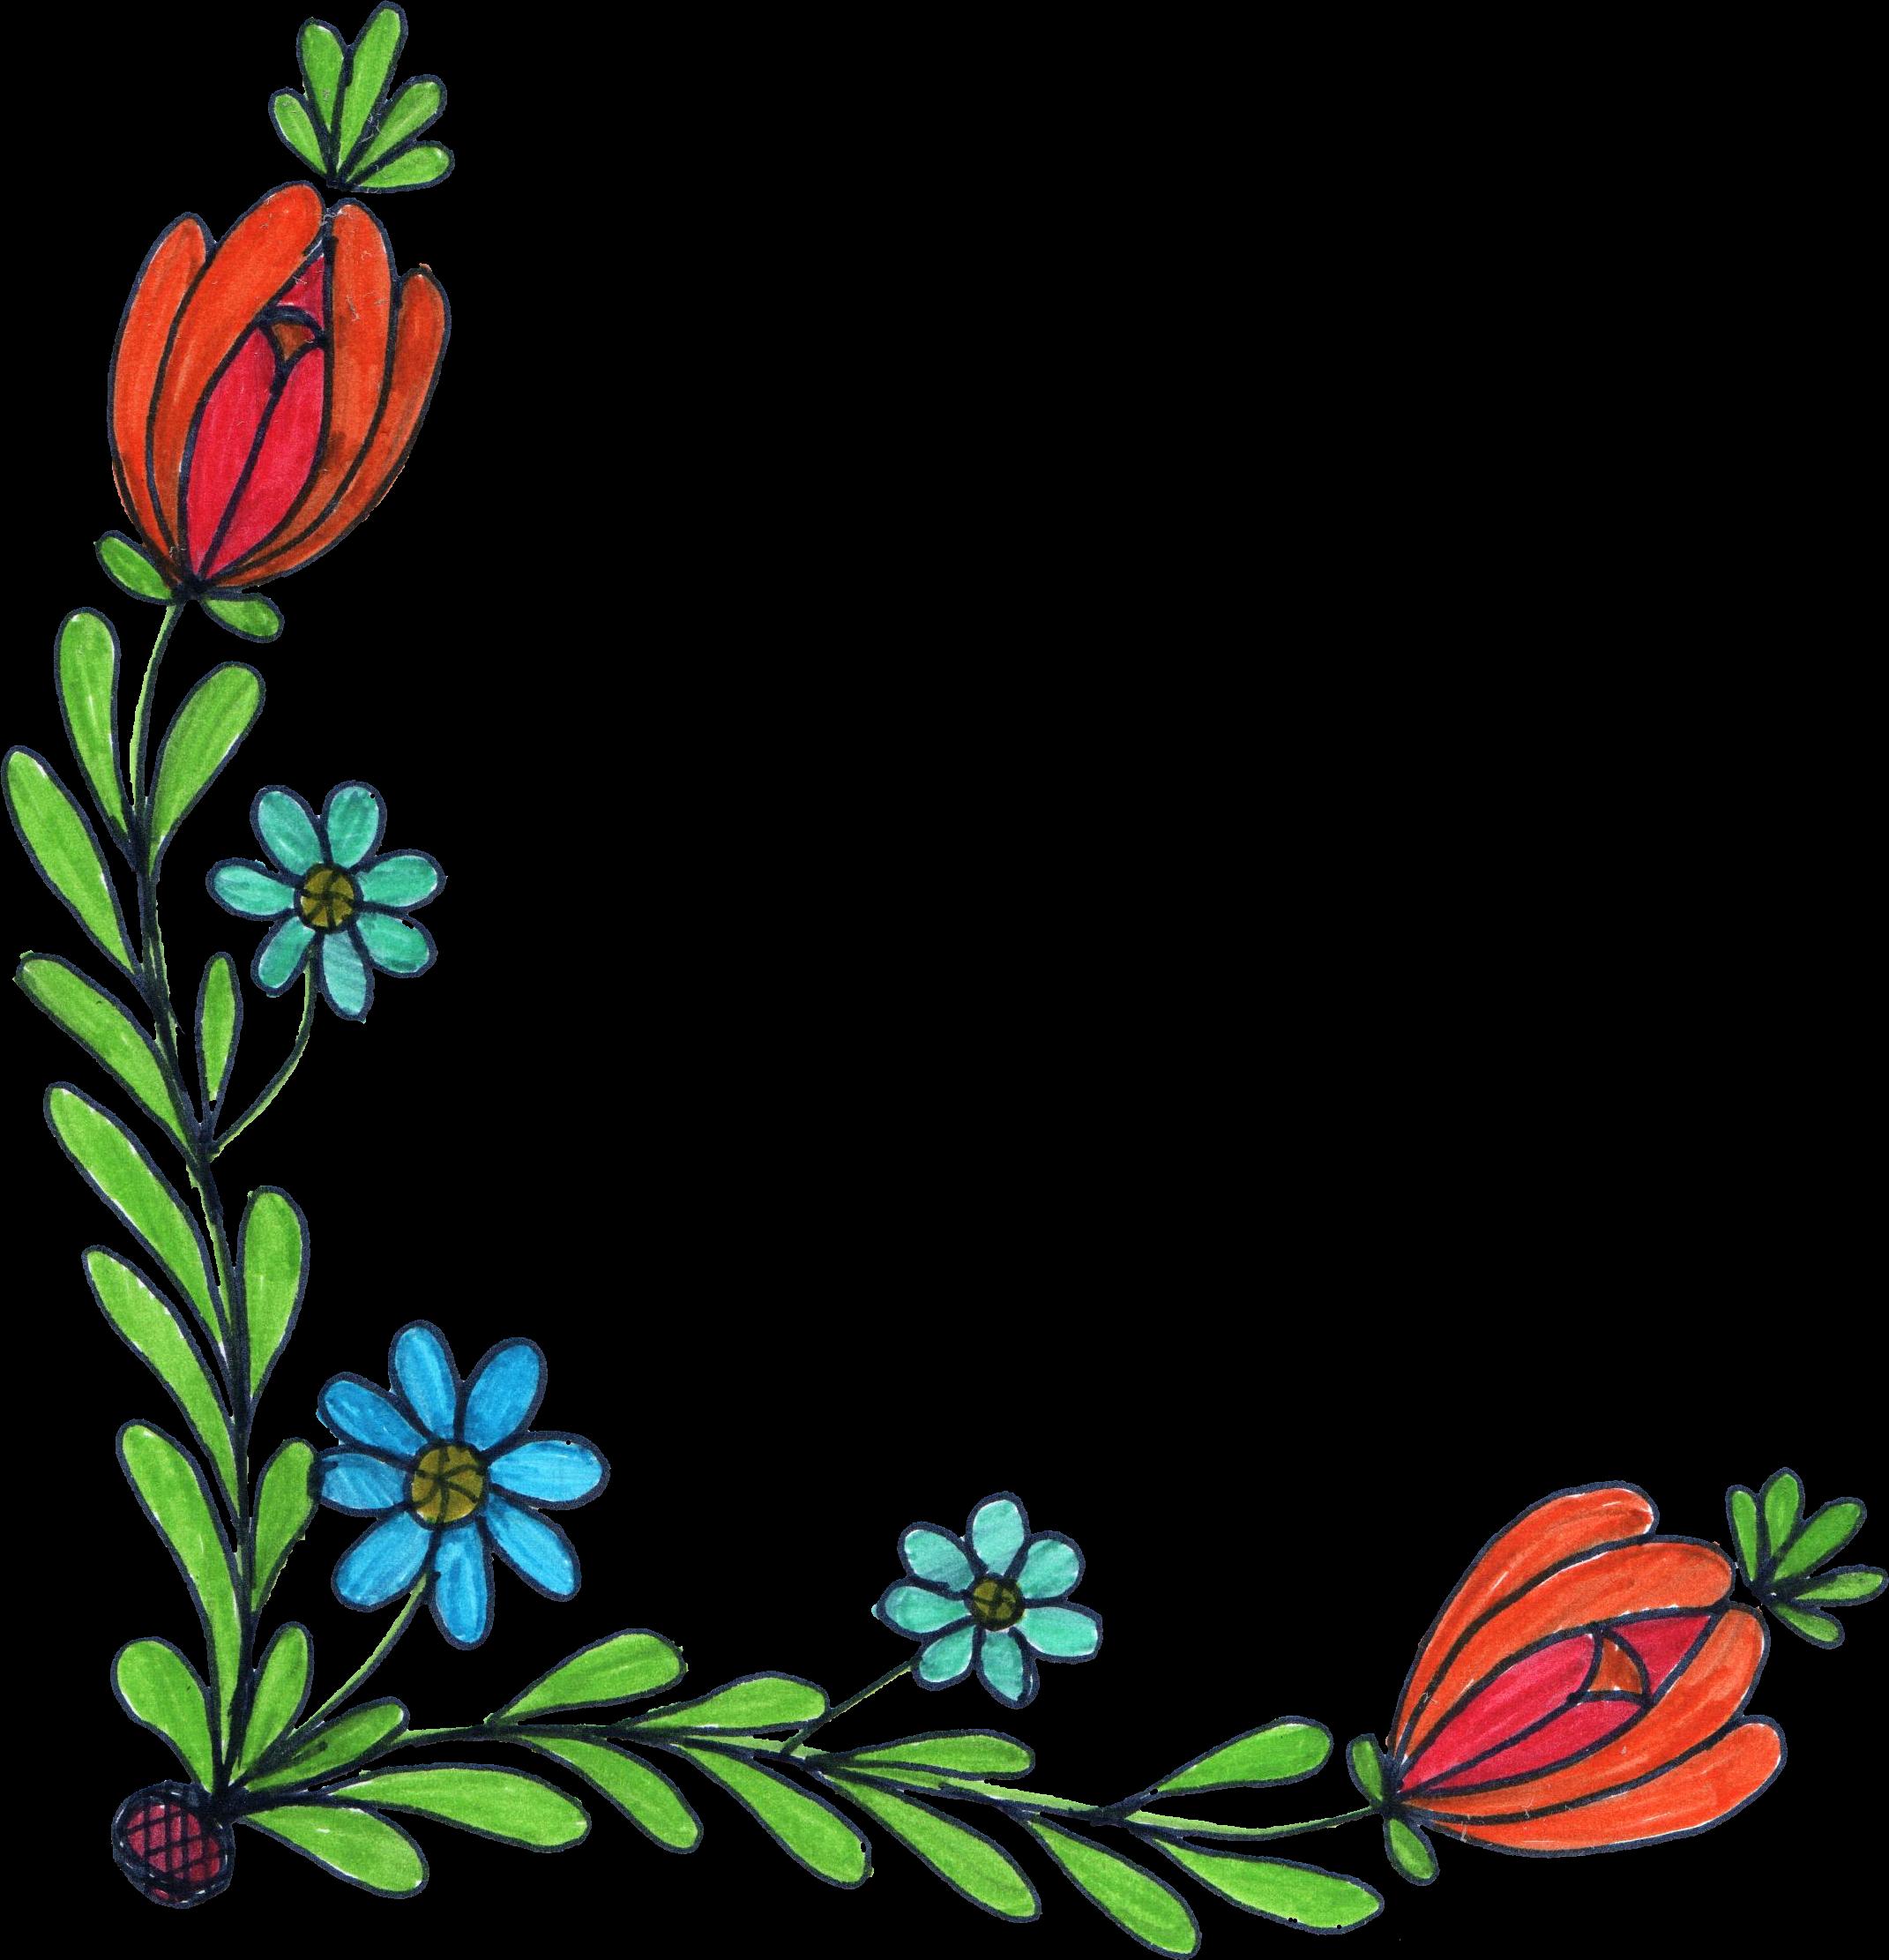 Free flower doodle clipart banner free download 5 Flower Corner Drawing (PNG Transparent) | OnlyGFX.com banner free download